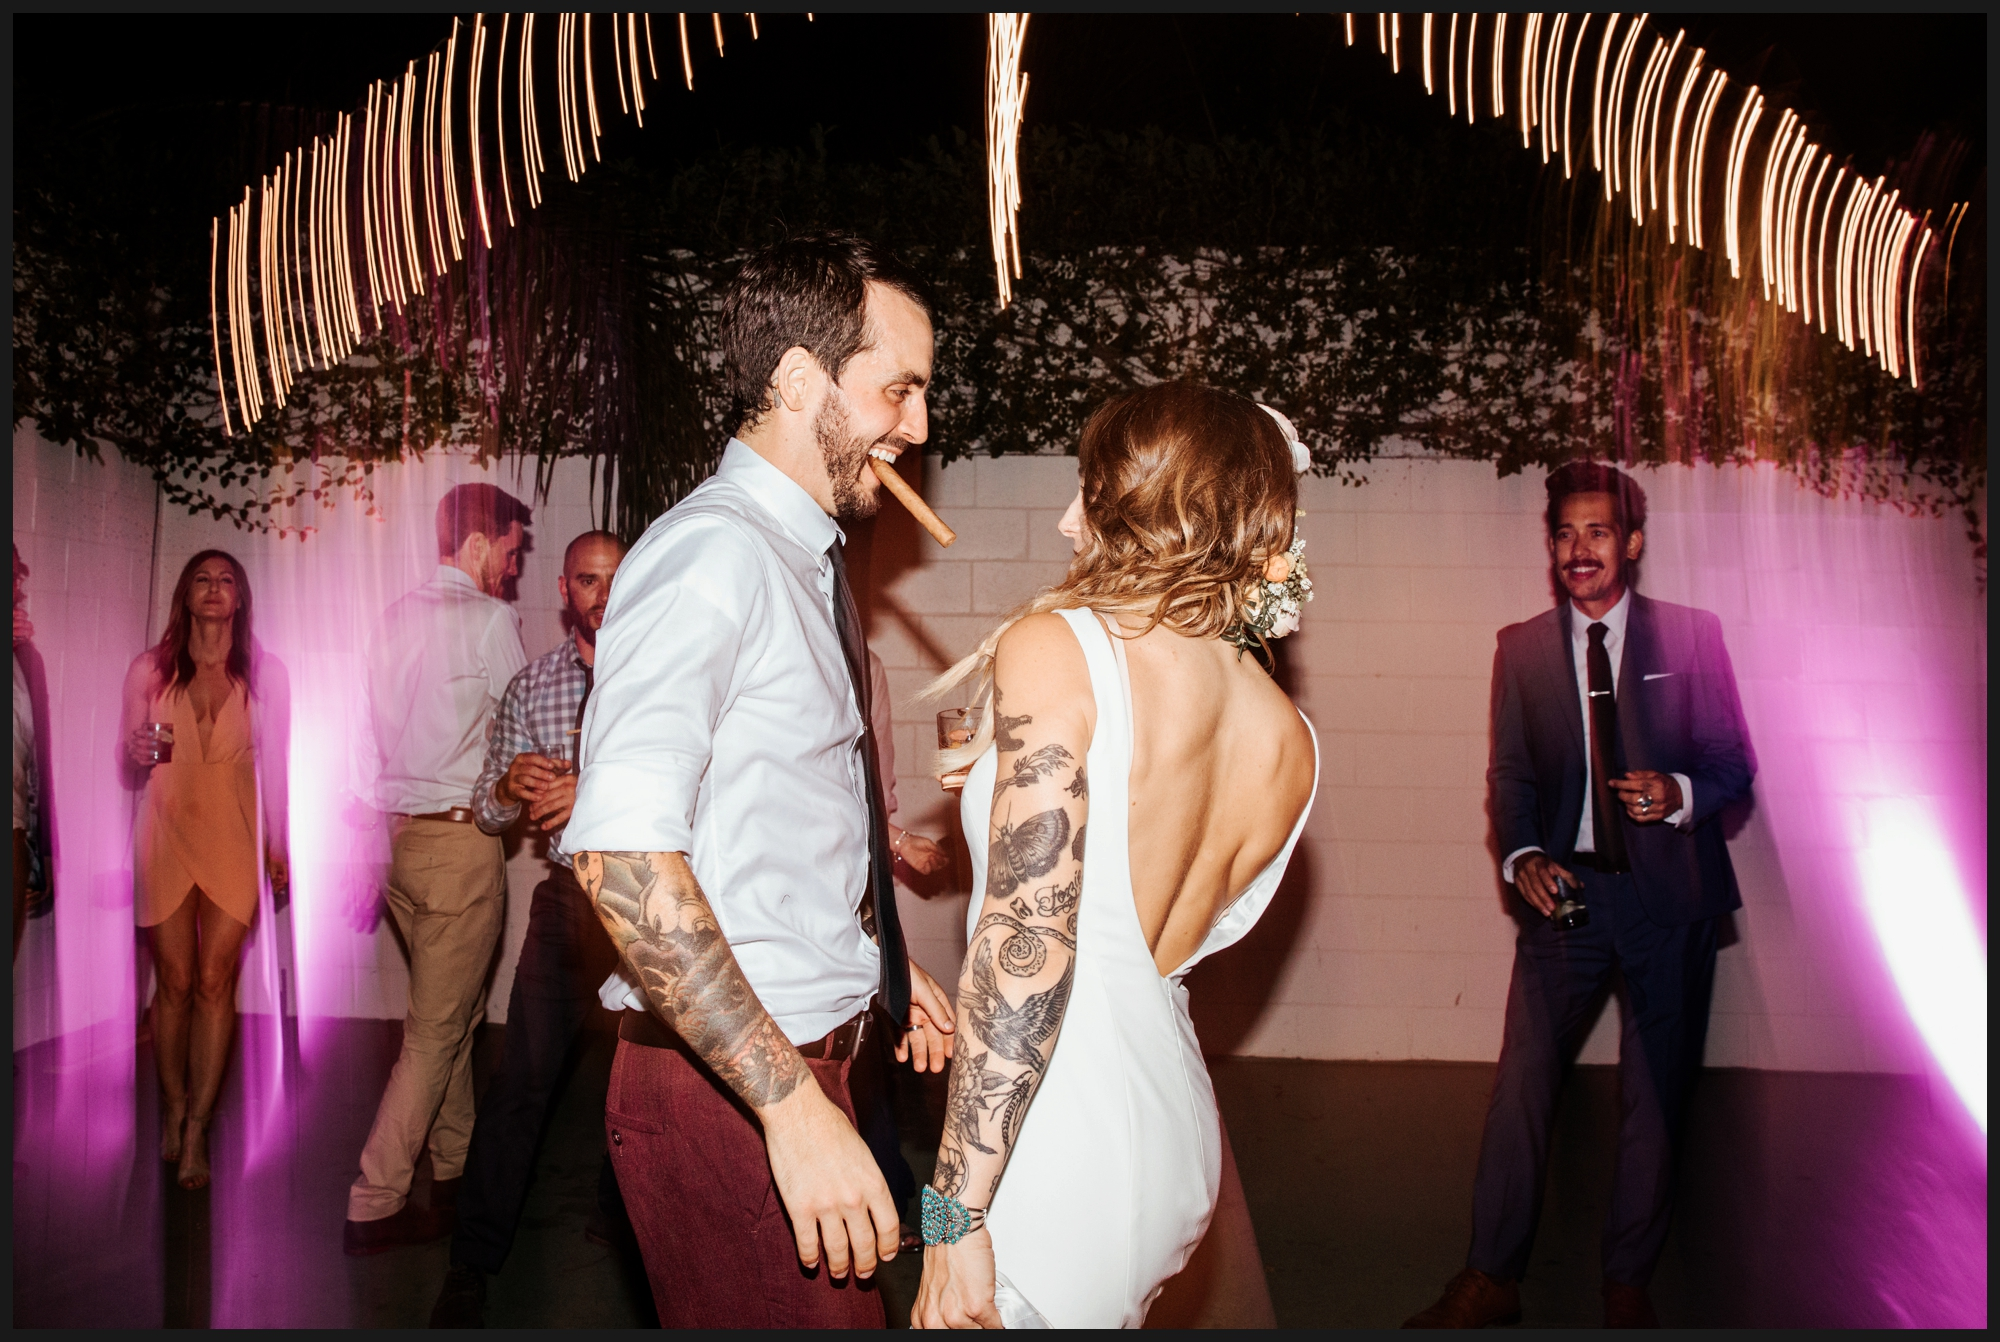 Orlando-Wedding-Photographer-destination-wedding-photographer-florida-wedding-photographer-bohemian-wedding-photographer_2056.jpg